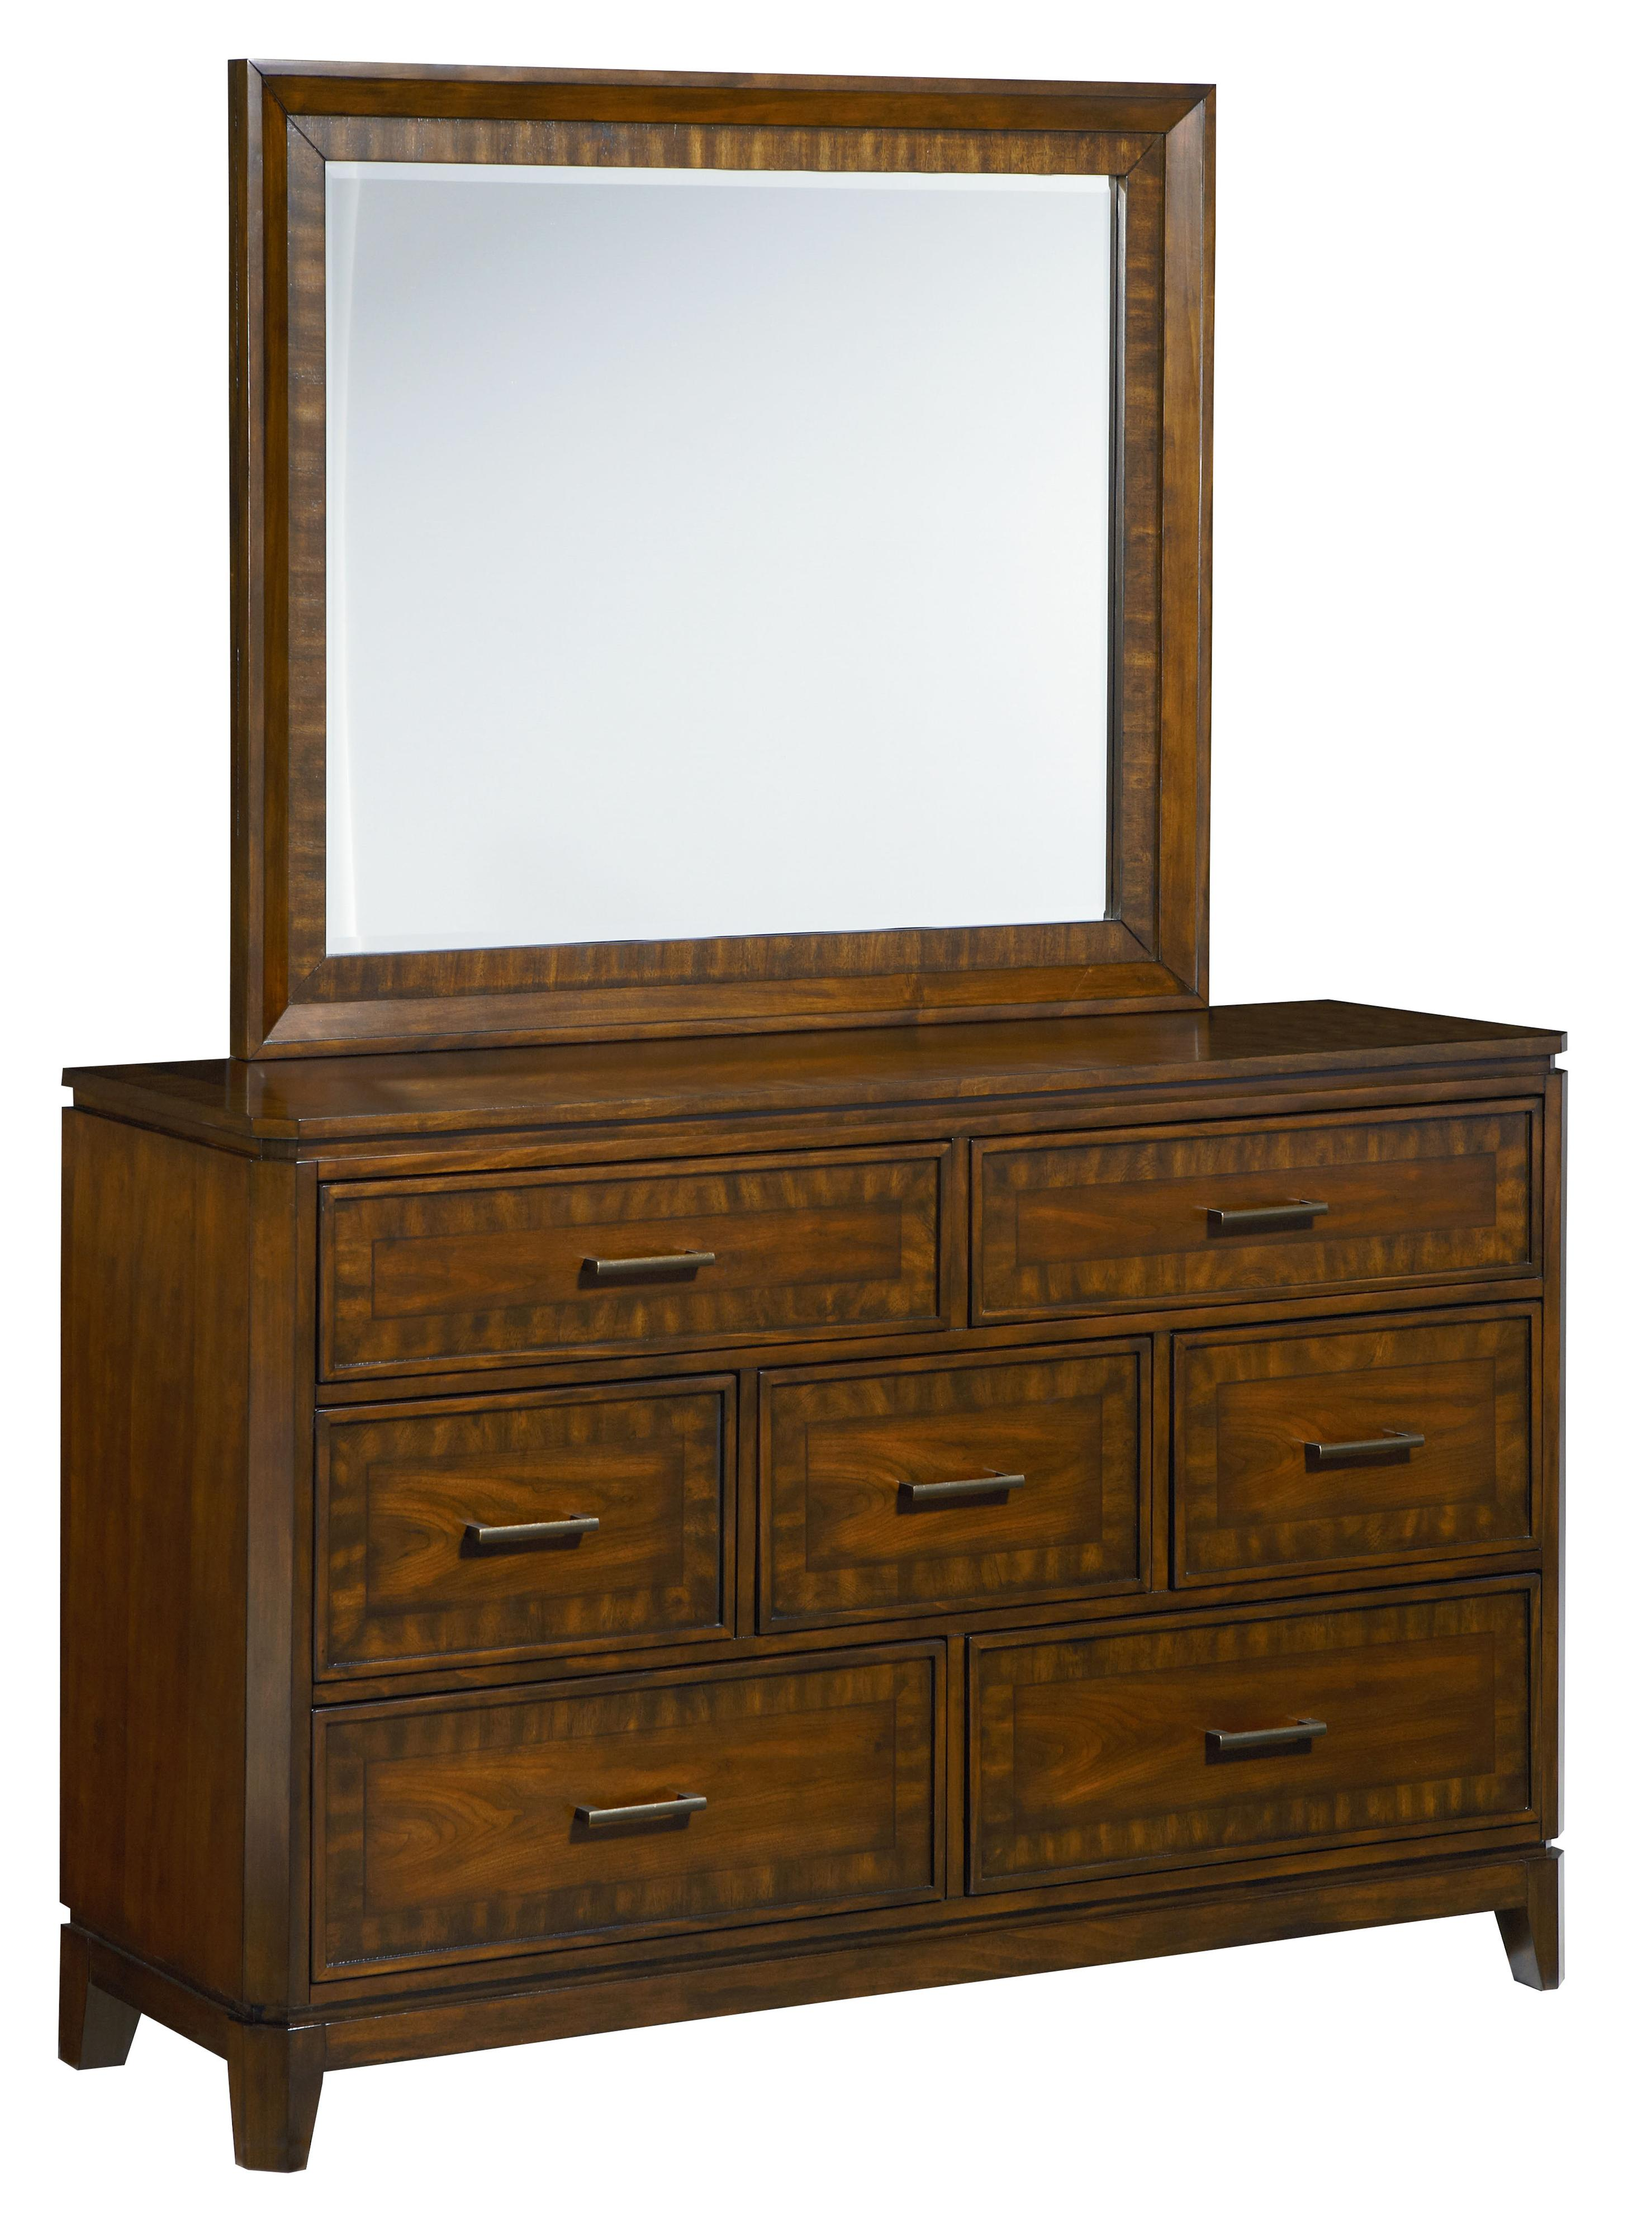 Standard Furniture Avion  Dresser with Mirror - Item Number: 86459+86458